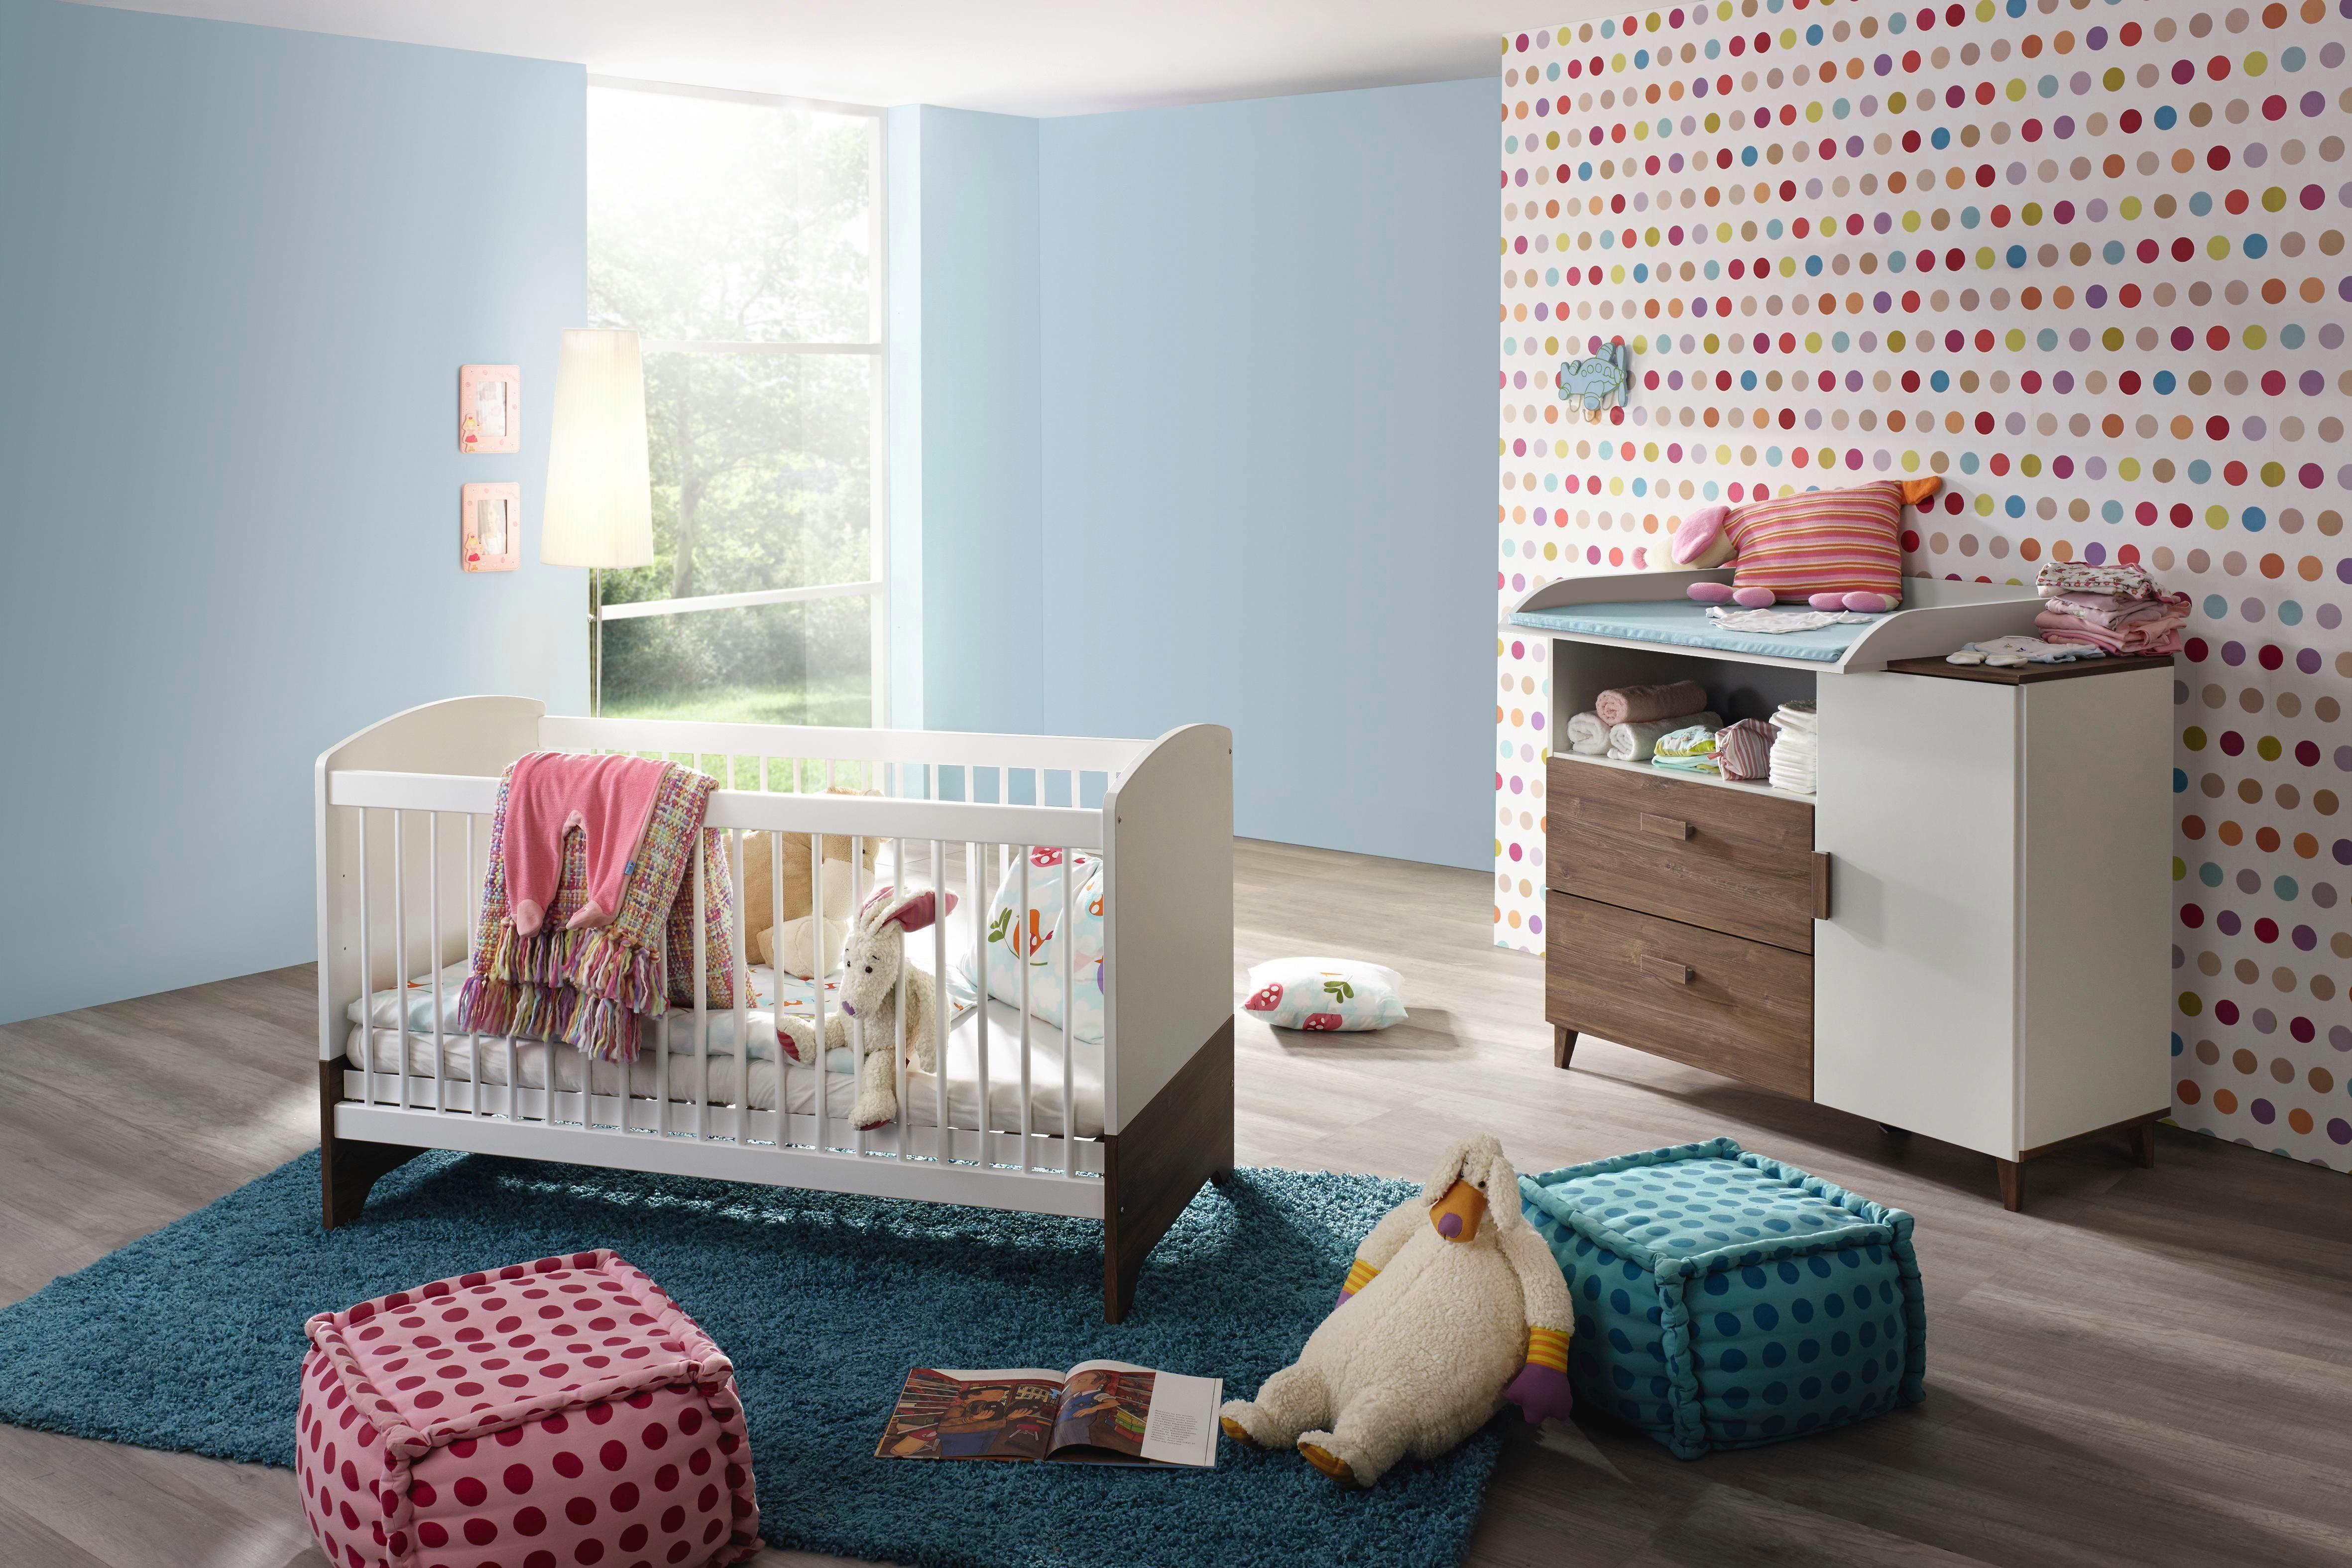 Babykamer Miami Kinderkamer : Babykamer lyon kopen bekijk de collectie otto